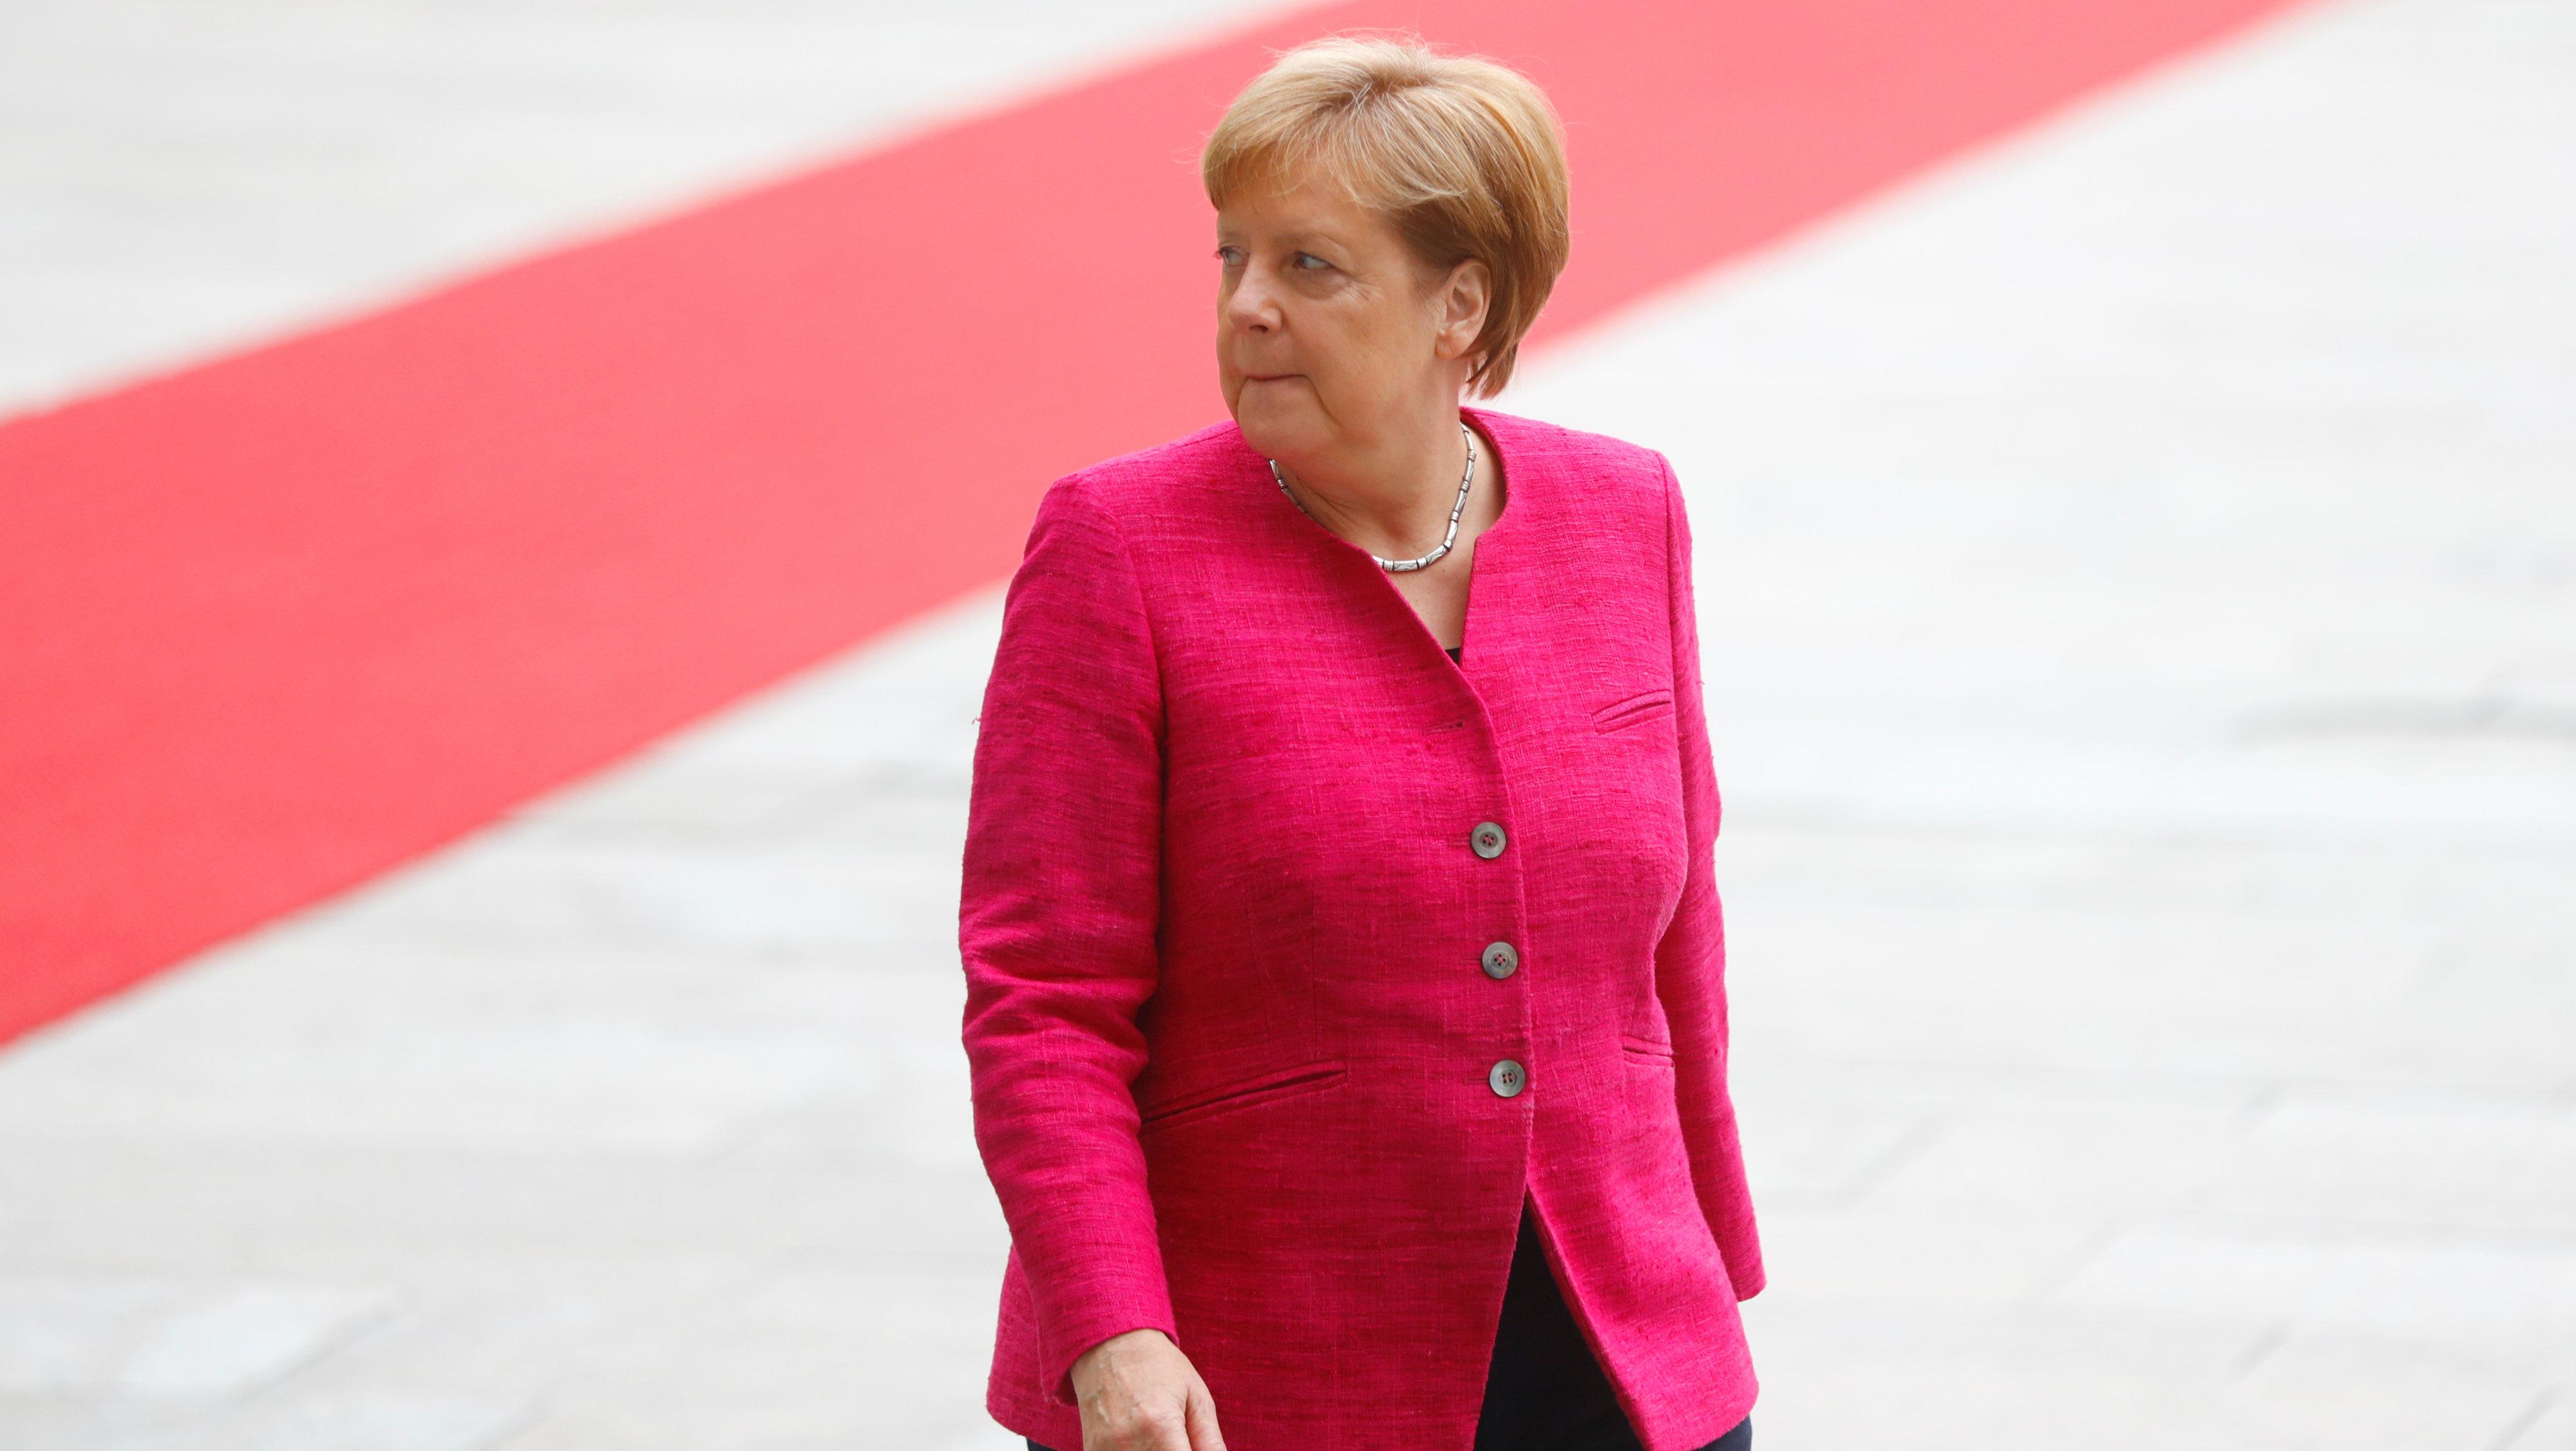 German chancellor Angela Merkel looks on as she welcomes Spanish Prime Minister Pedro Sanchez